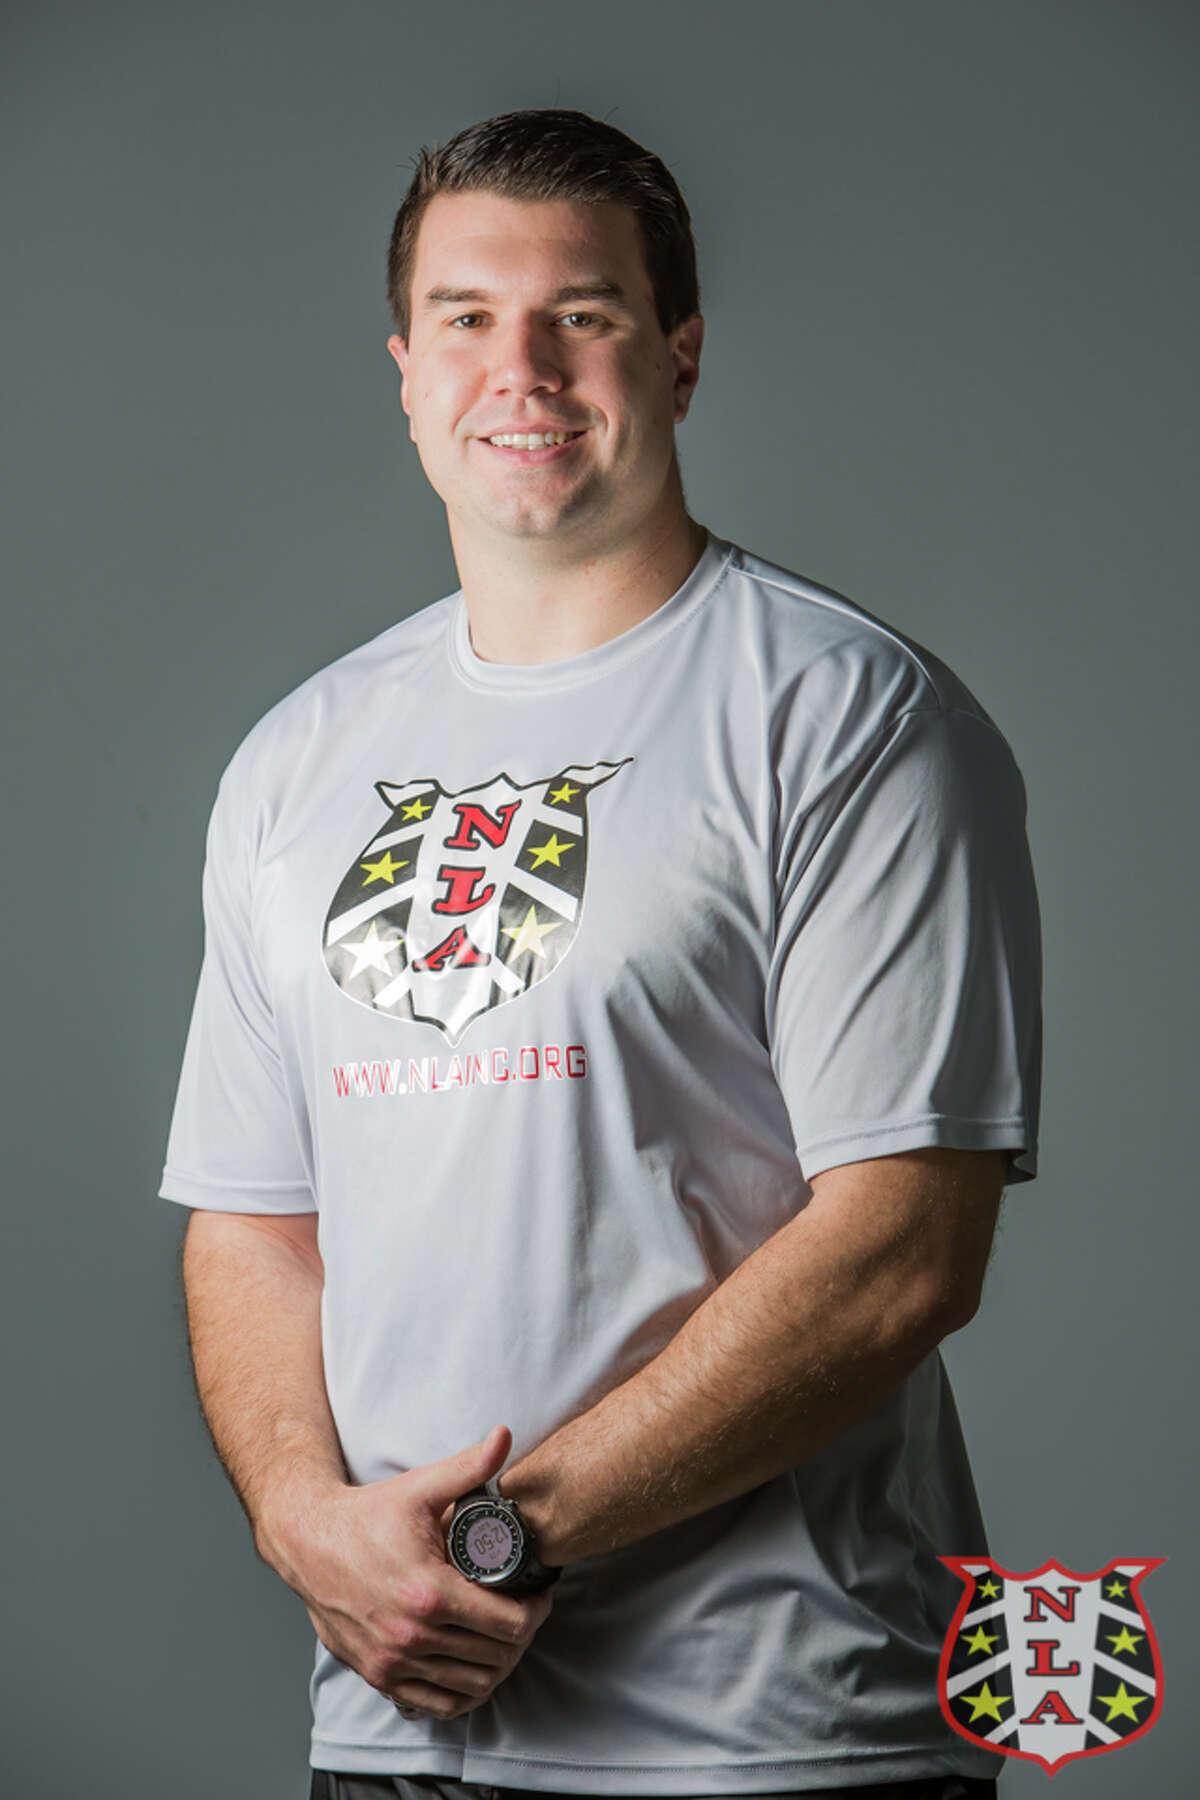 Faith West Academy has hired first-year coach Jacob Phillips to lead the Eagles' football team this season.